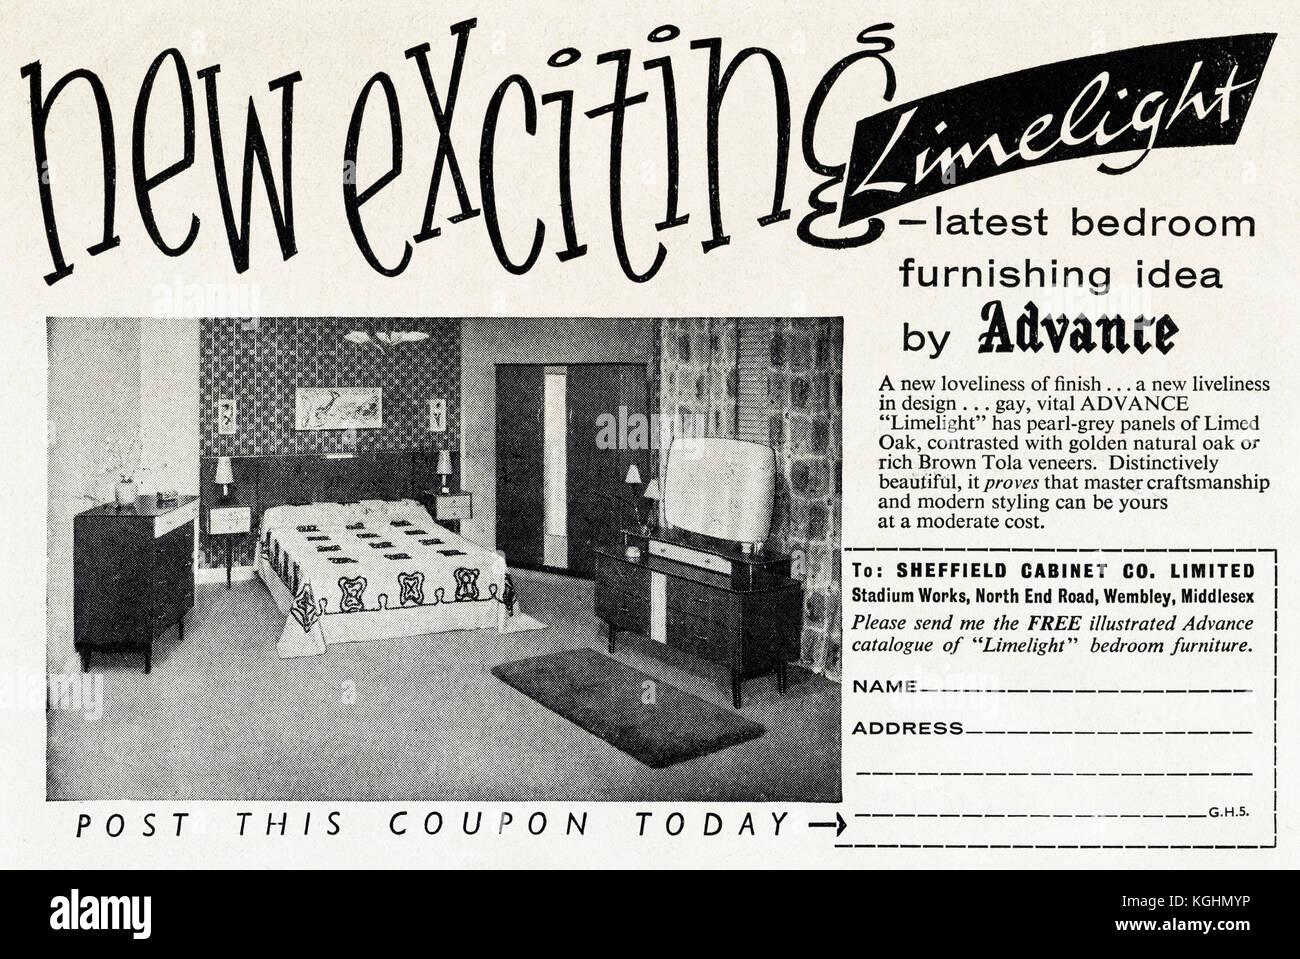 1950 Old Vintage Advert Original Magazine Anglais Imprimer Publicite